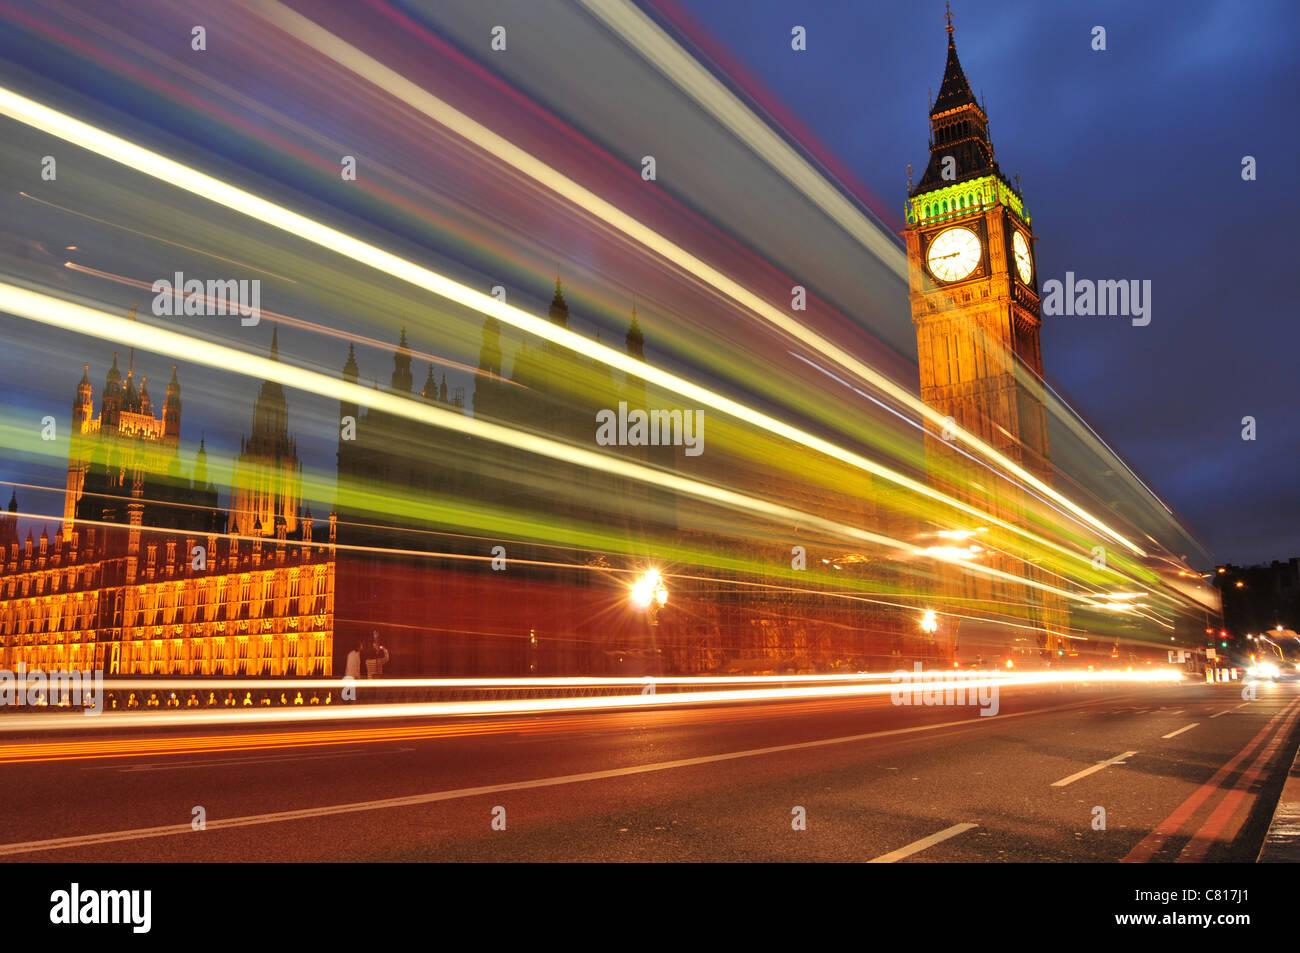 Londres à noite Imagens de Stock